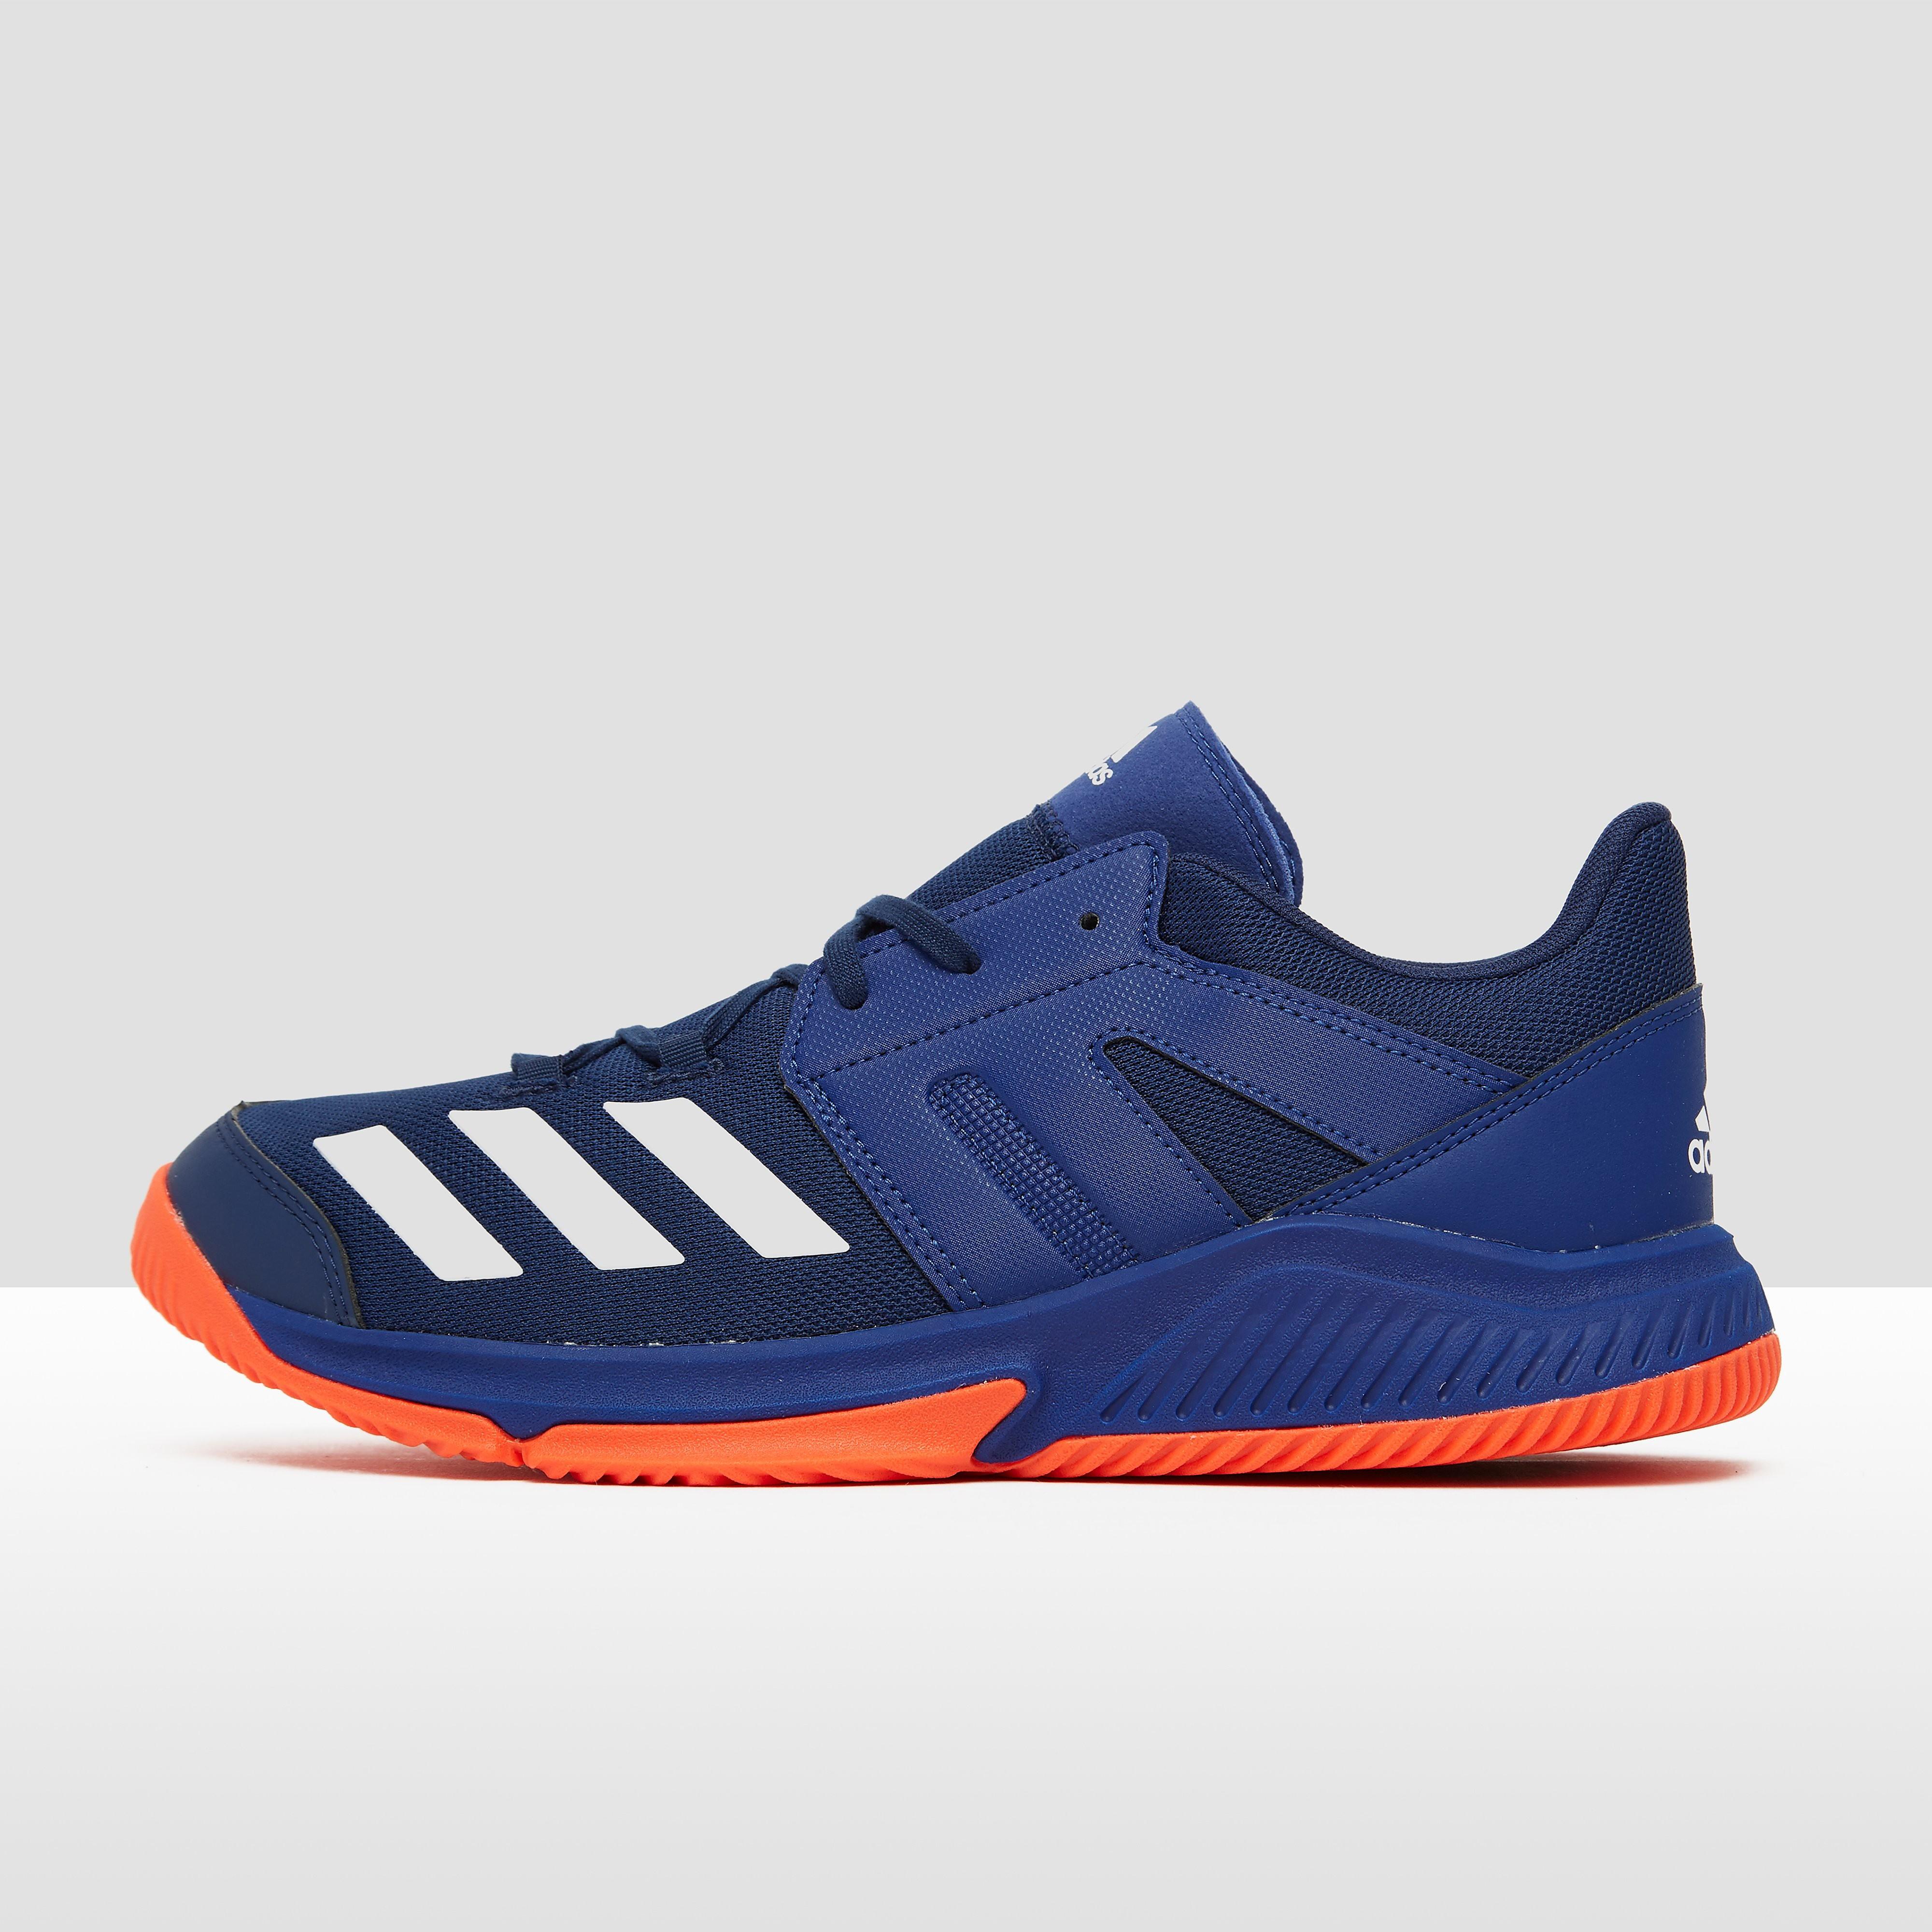 Essence Sportschoenen Blauw-Rood Heren Blue-Red